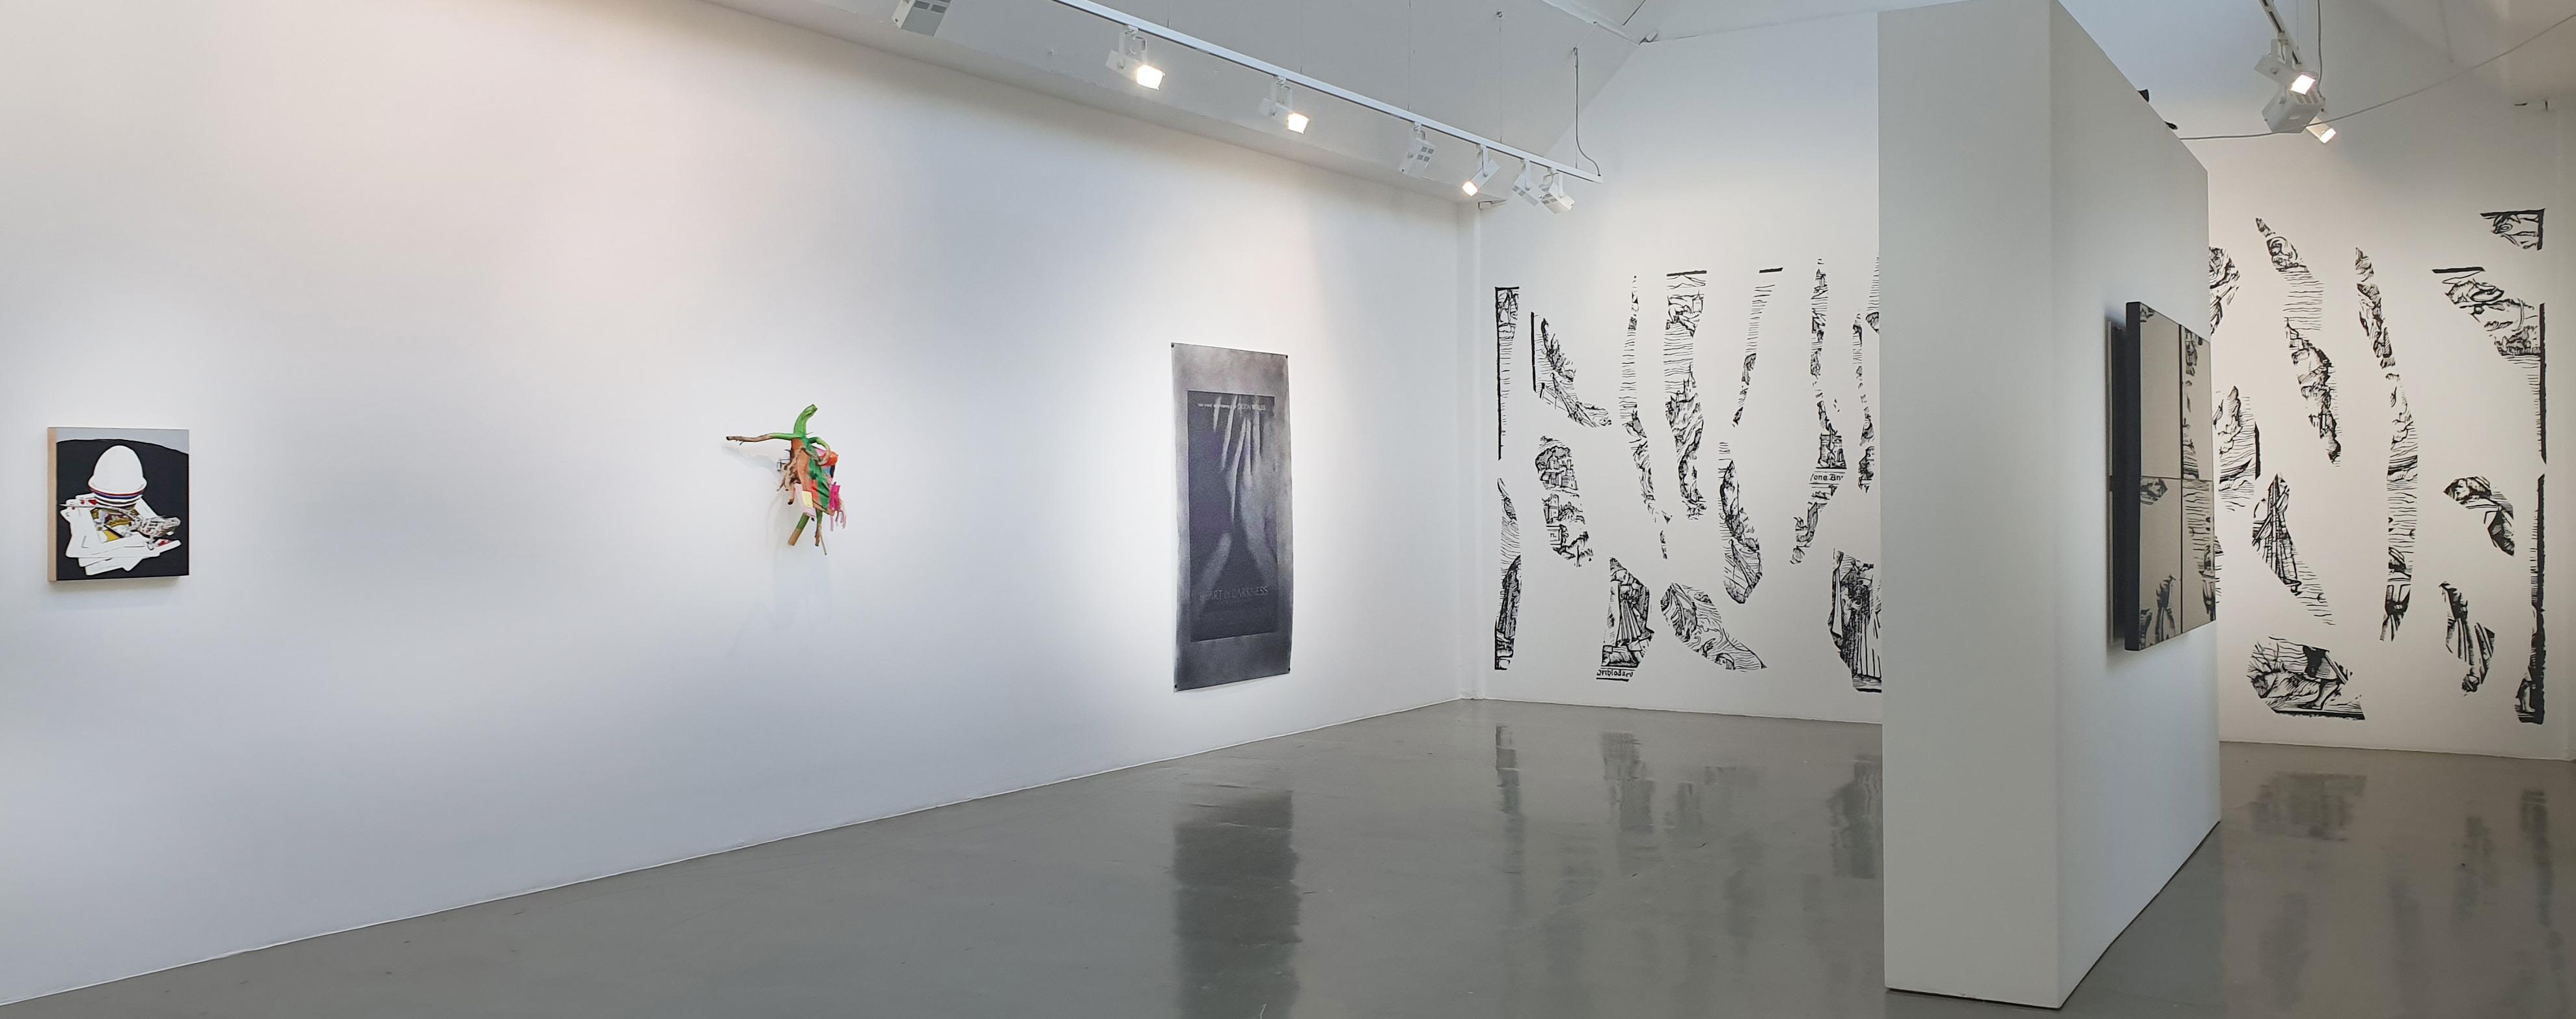 Galerie Barbara Thumm \ 1301PE@GBT